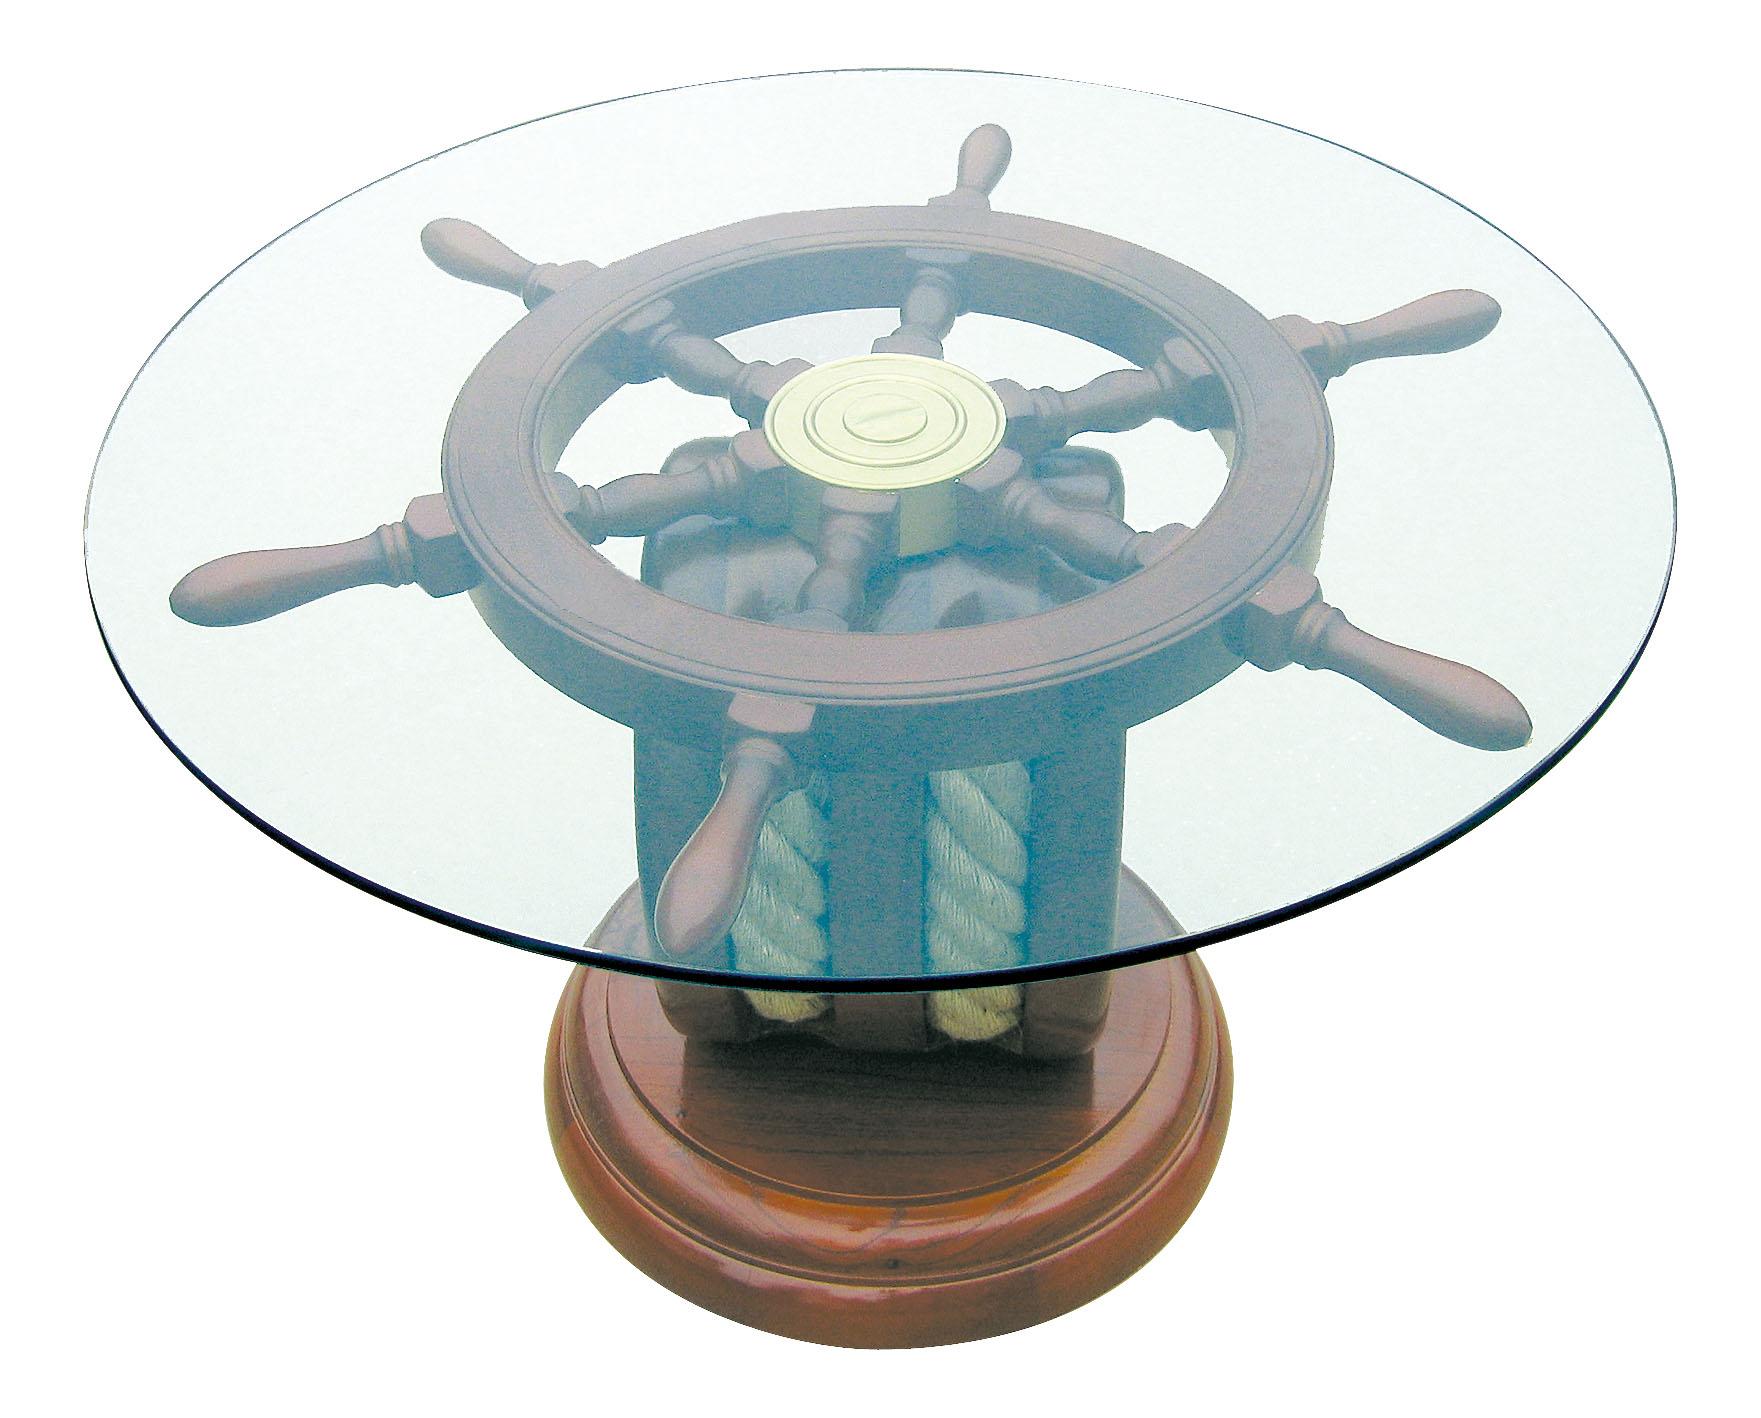 Steuerradtisch block perfekt f r die maritime for Maritime wohnaccessoires